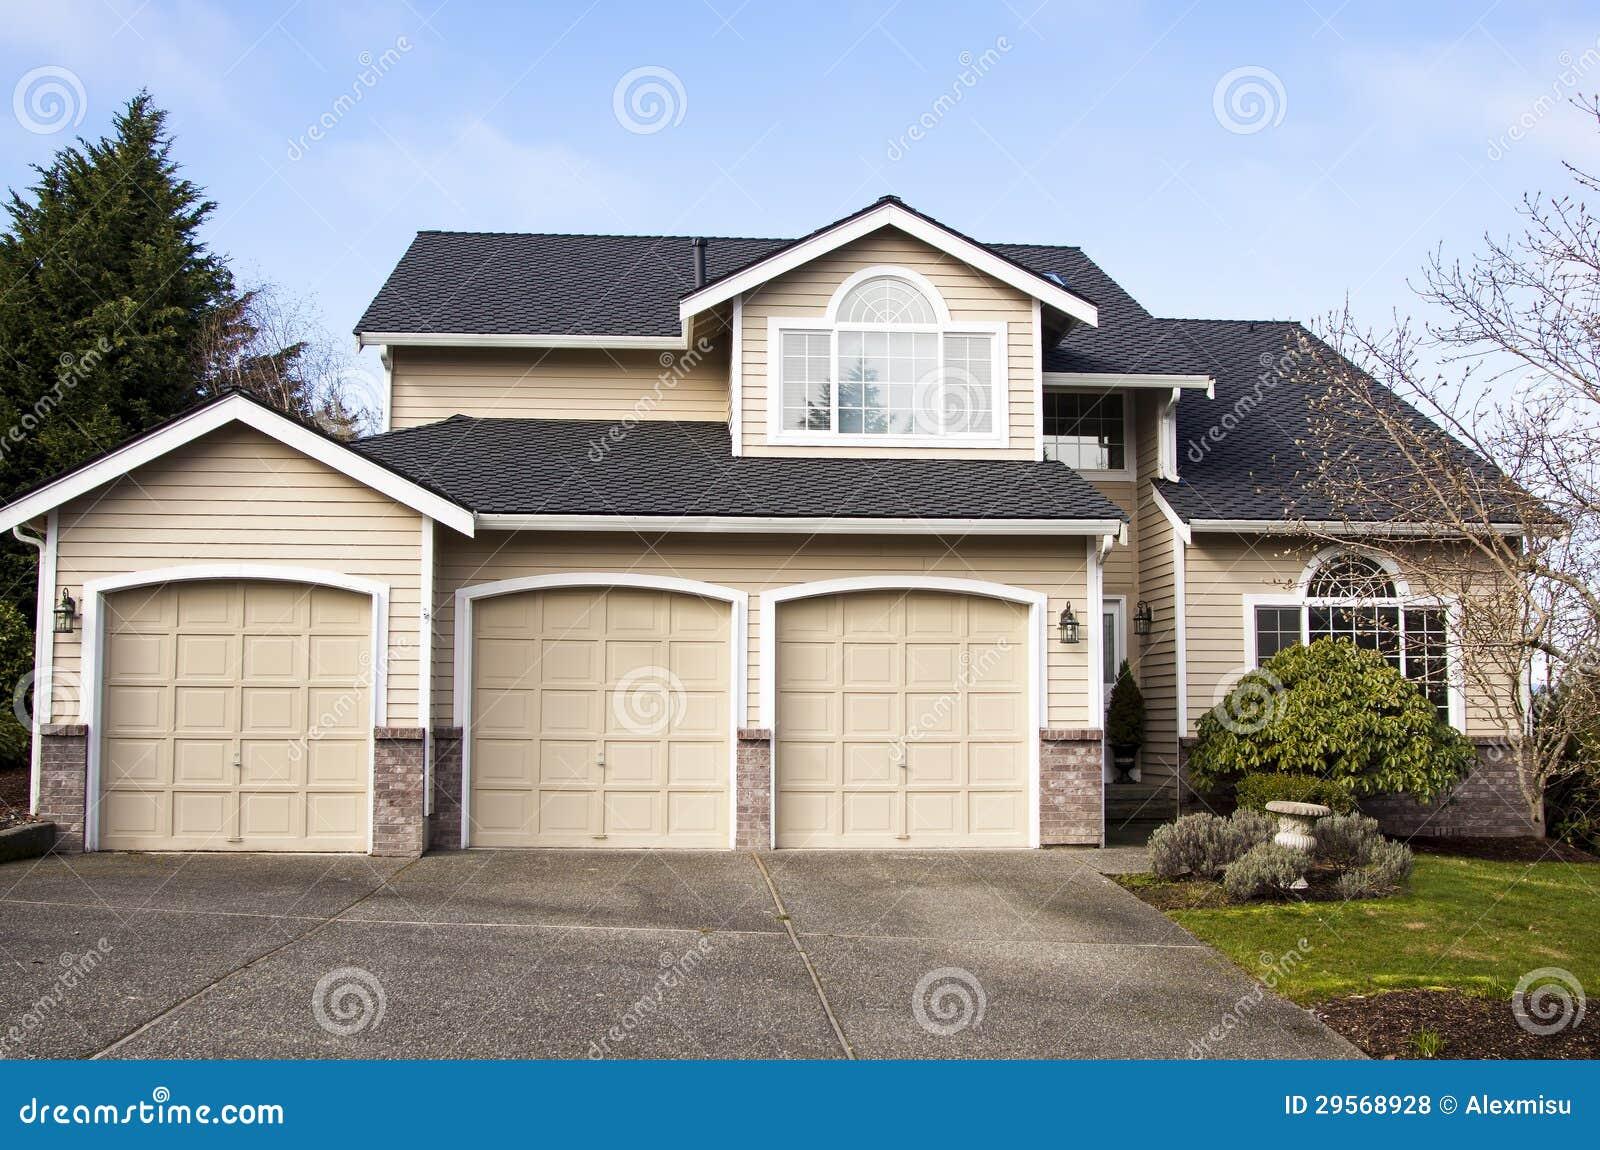 Suburban House Royalty Free Stock Photos Image 29568928